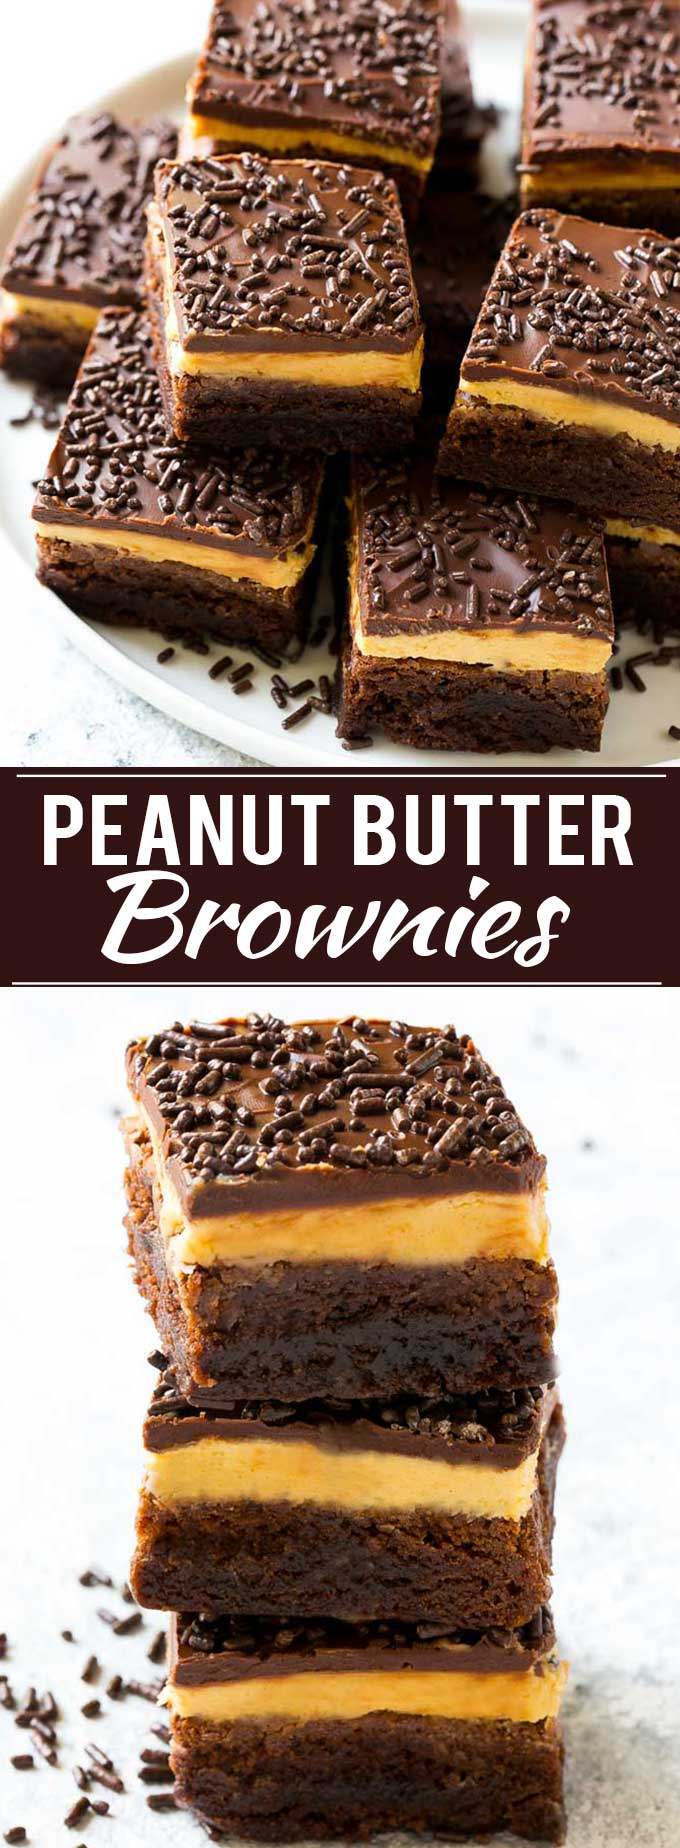 Peanut Butter Brownies Recipe | Layered Brownies | Peanut Butter Truffle Brownies #brownies #chocolate #peanutbutter #dessert #dinneratthezoo